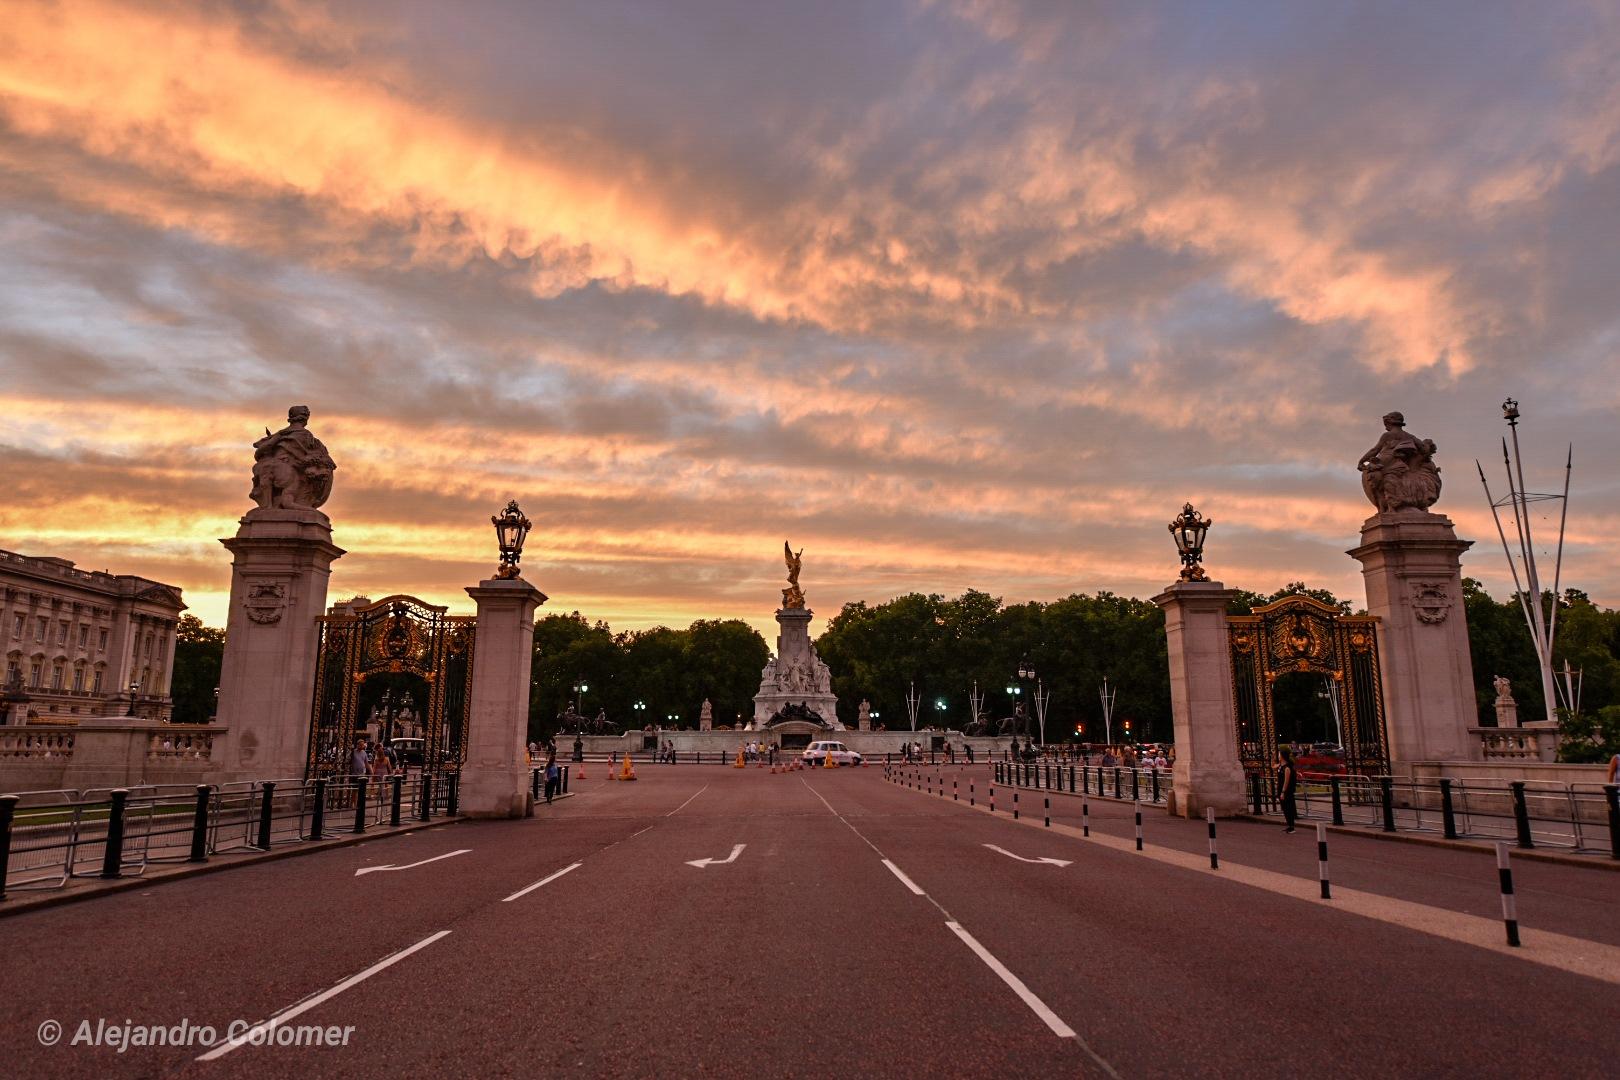 Buckingham Palace by Alejandro Colomer